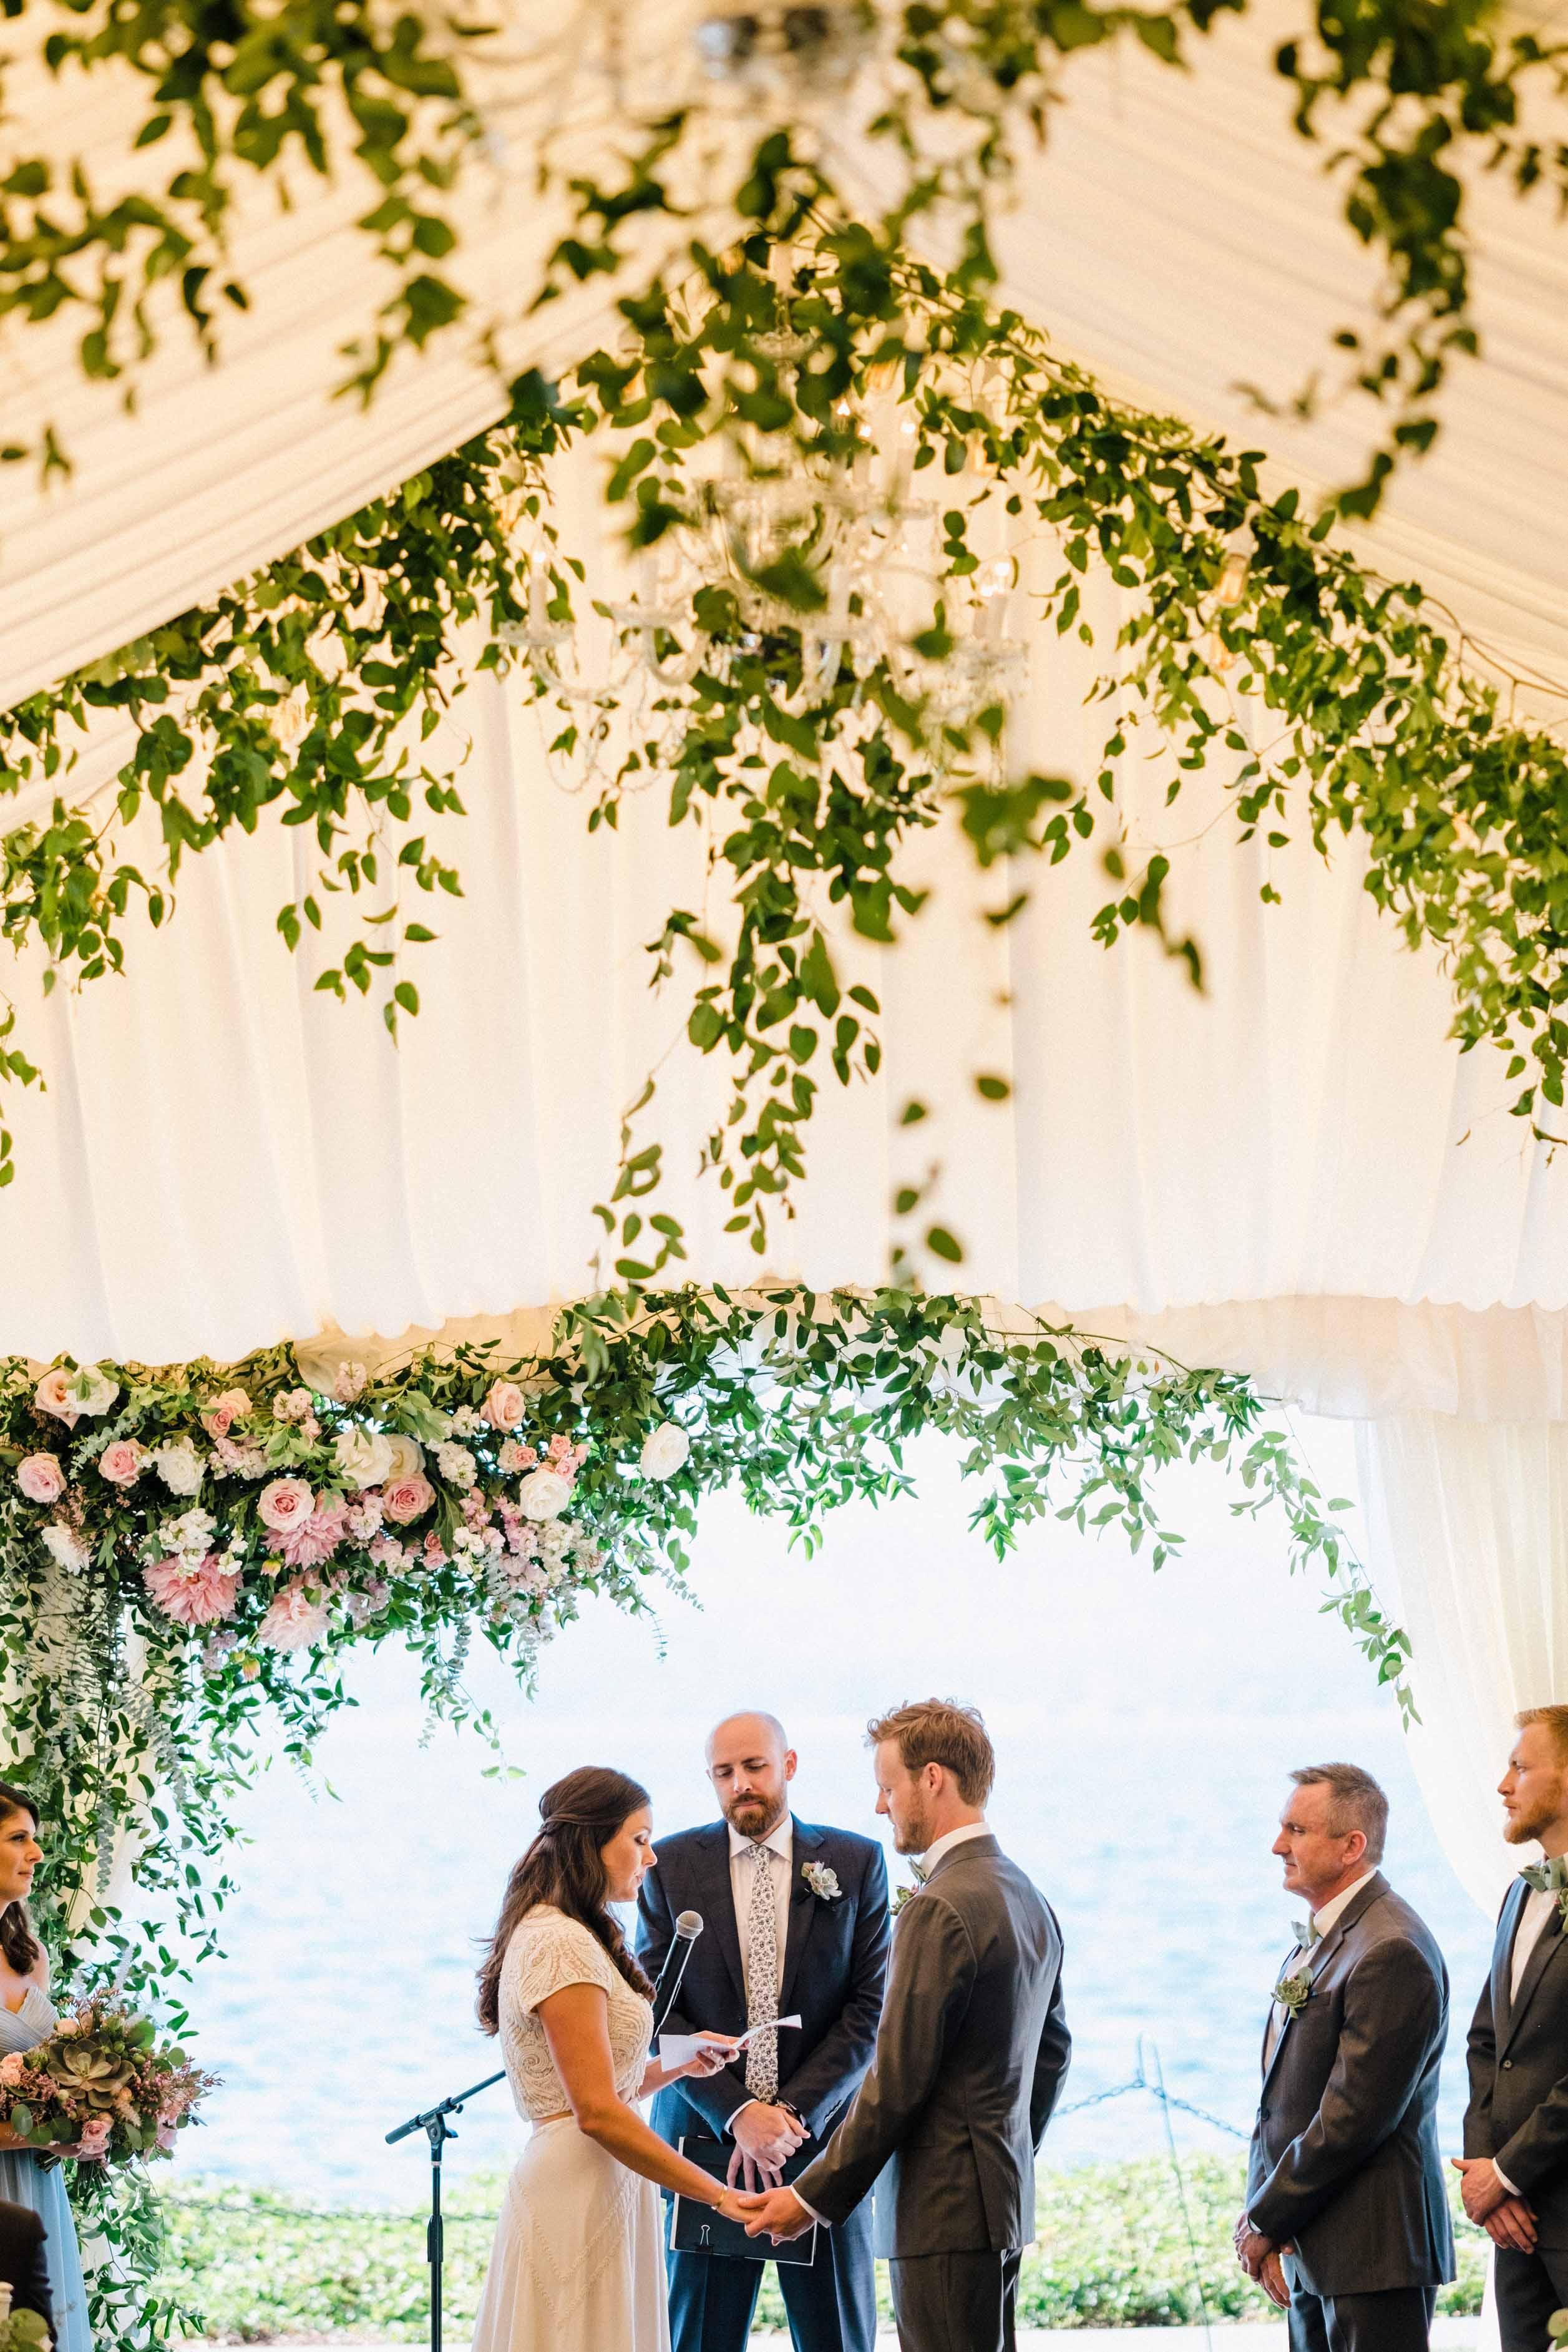 Wedding ceremony at the Woodmark Hotel - Woodmark Hotel Wedding by Flora Nova Design Seattle